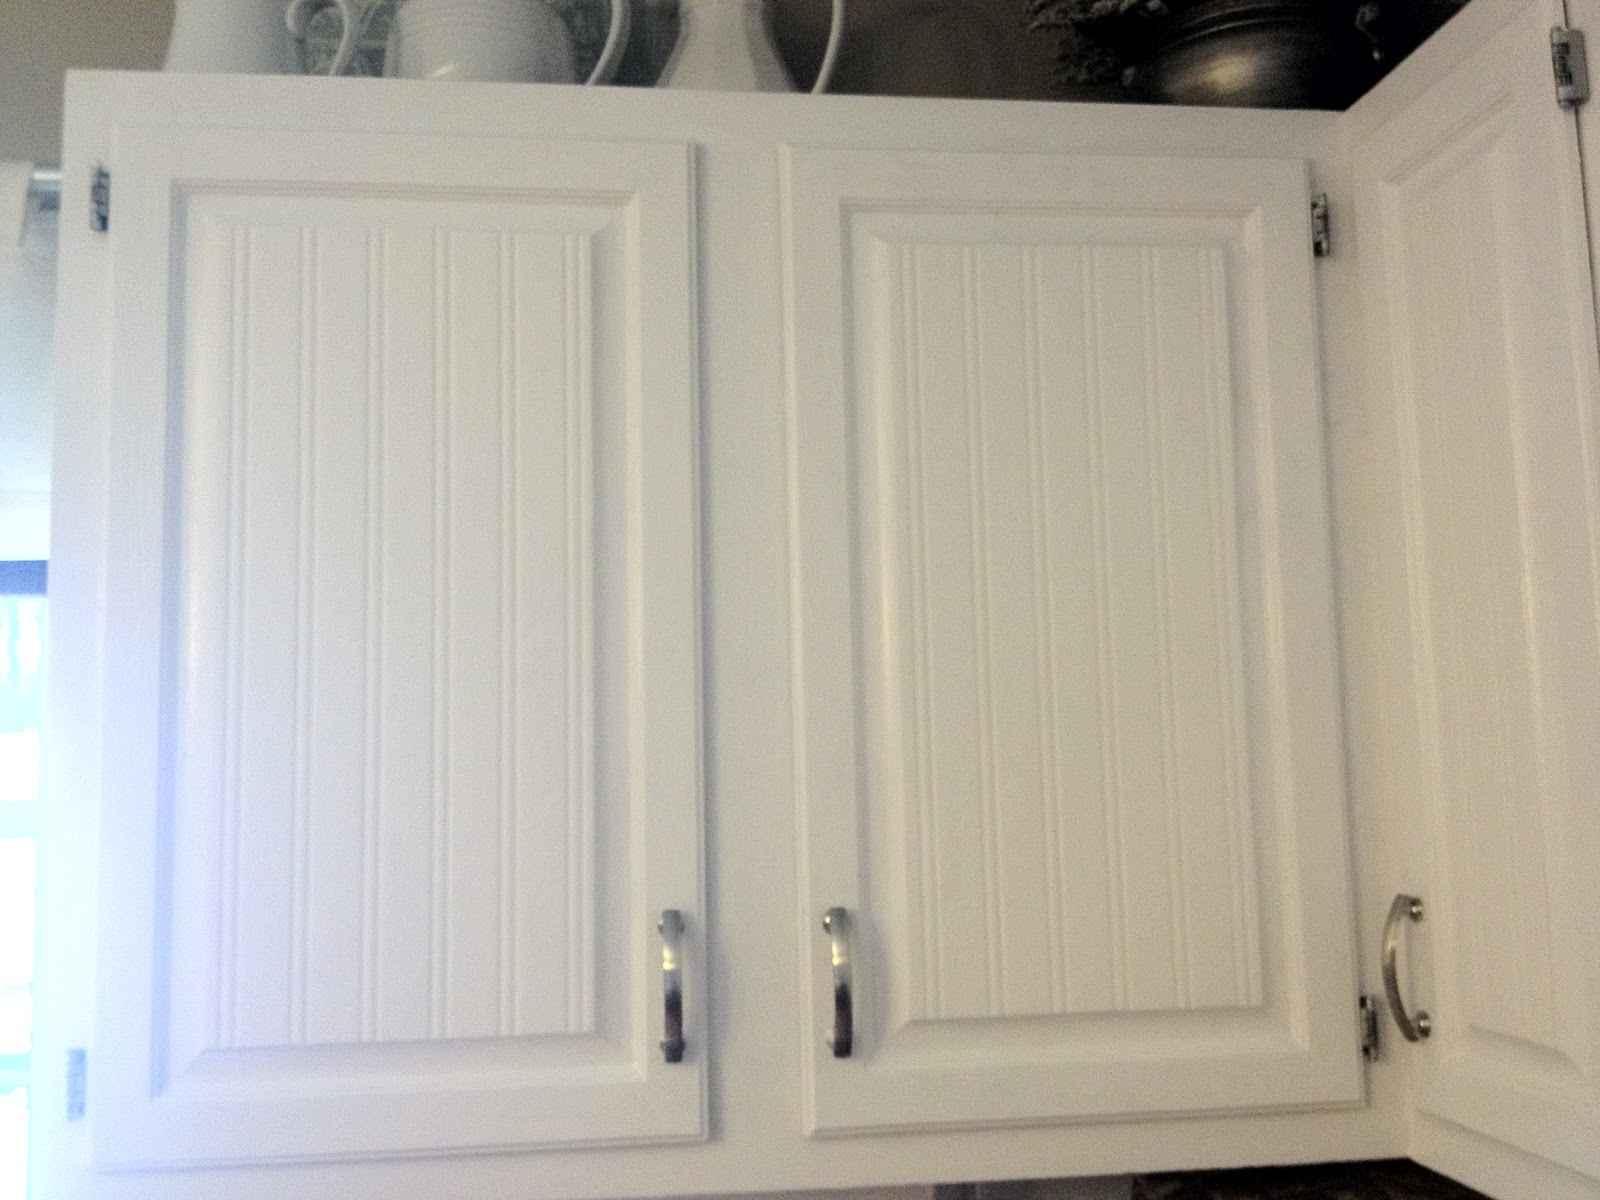 Beadboard Kitchen Cabinets Home Depot Free download Beadboard Home Depot Feel The Home [1600x1200] for